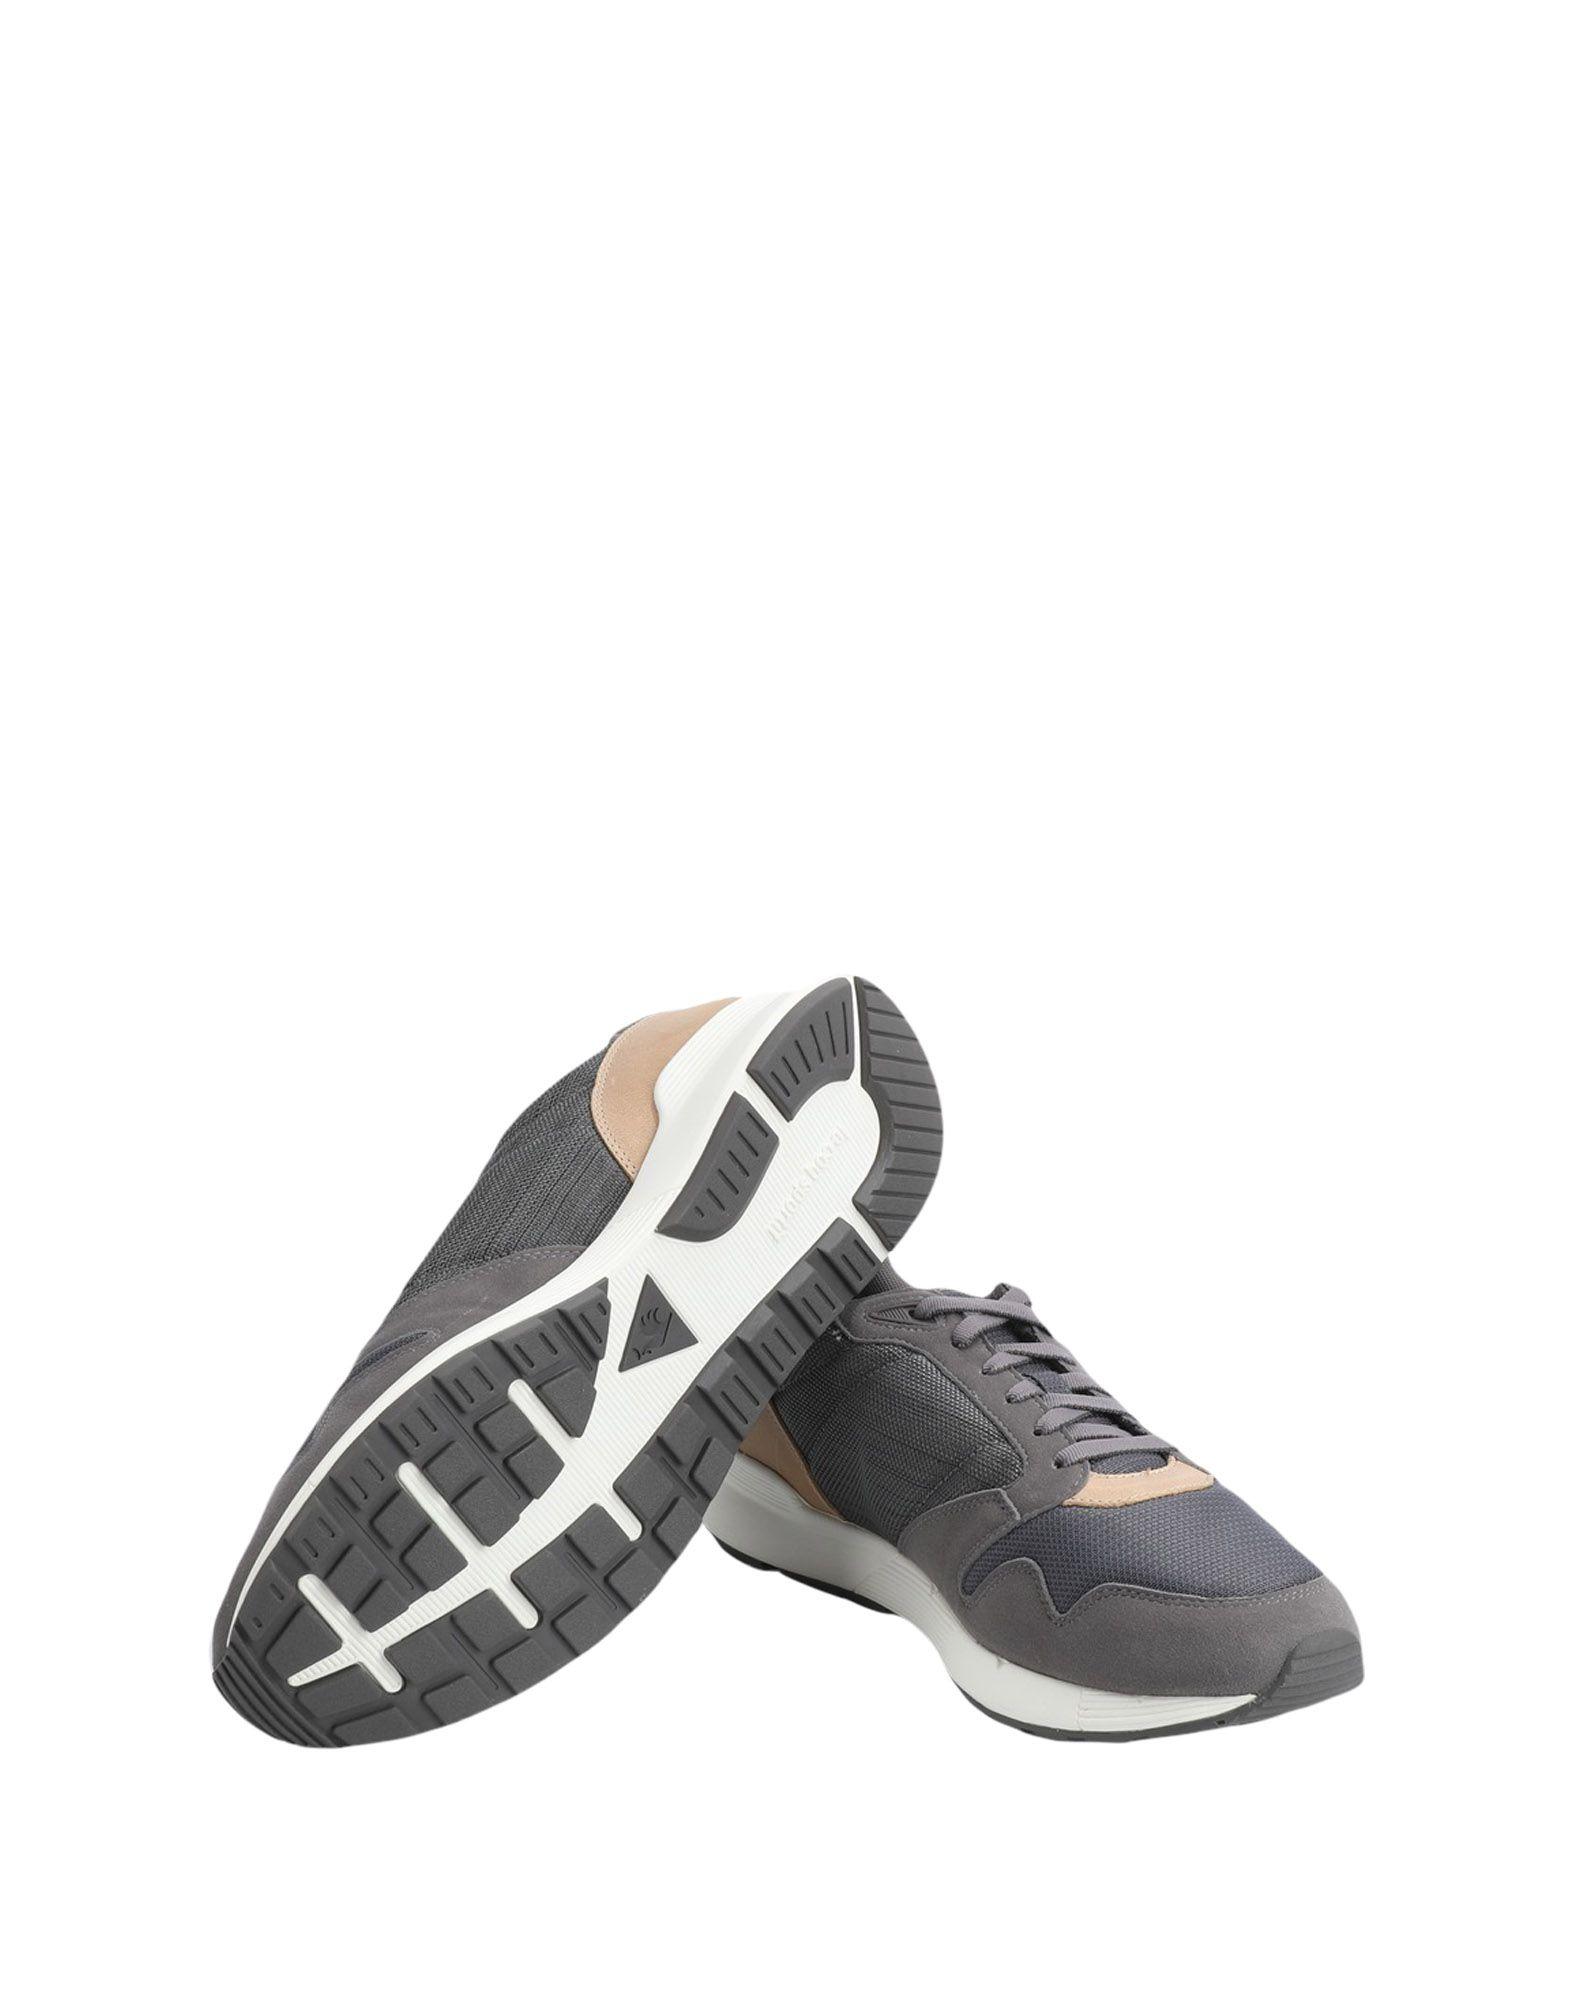 Rabatt echte Schuhe Le Craft Coq Sportif Omega X Craft Le  11340658AP 59c348